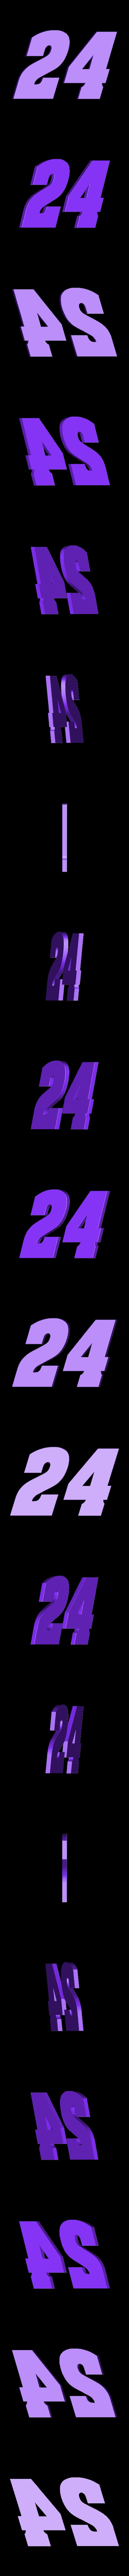 24_Yellow.stl Download free STL file JEFF GORDON #24 • 3D printer model, GREGCAR_3DPrinting